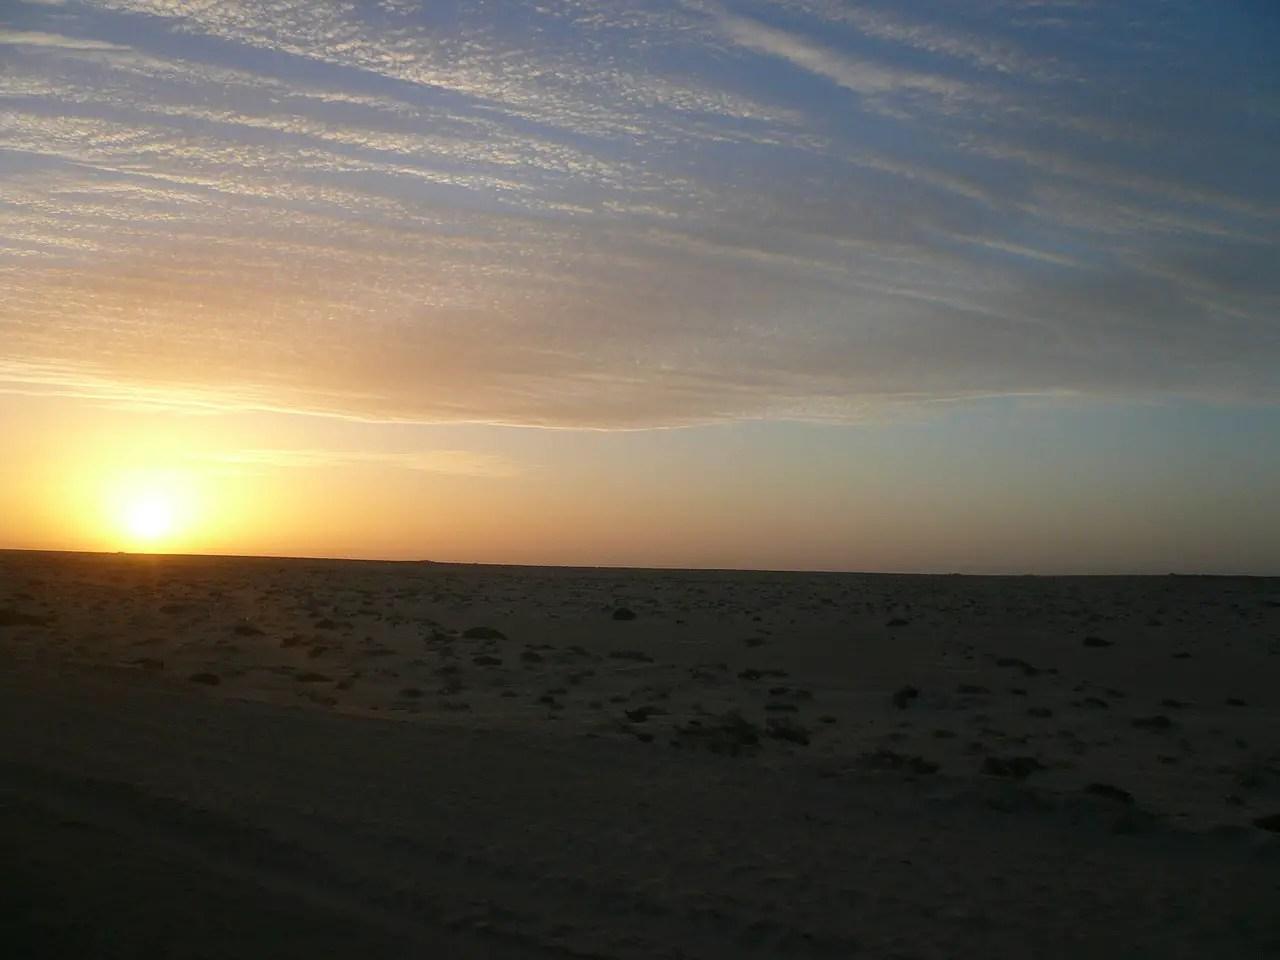 Dakhla, Western Sahara, Africa